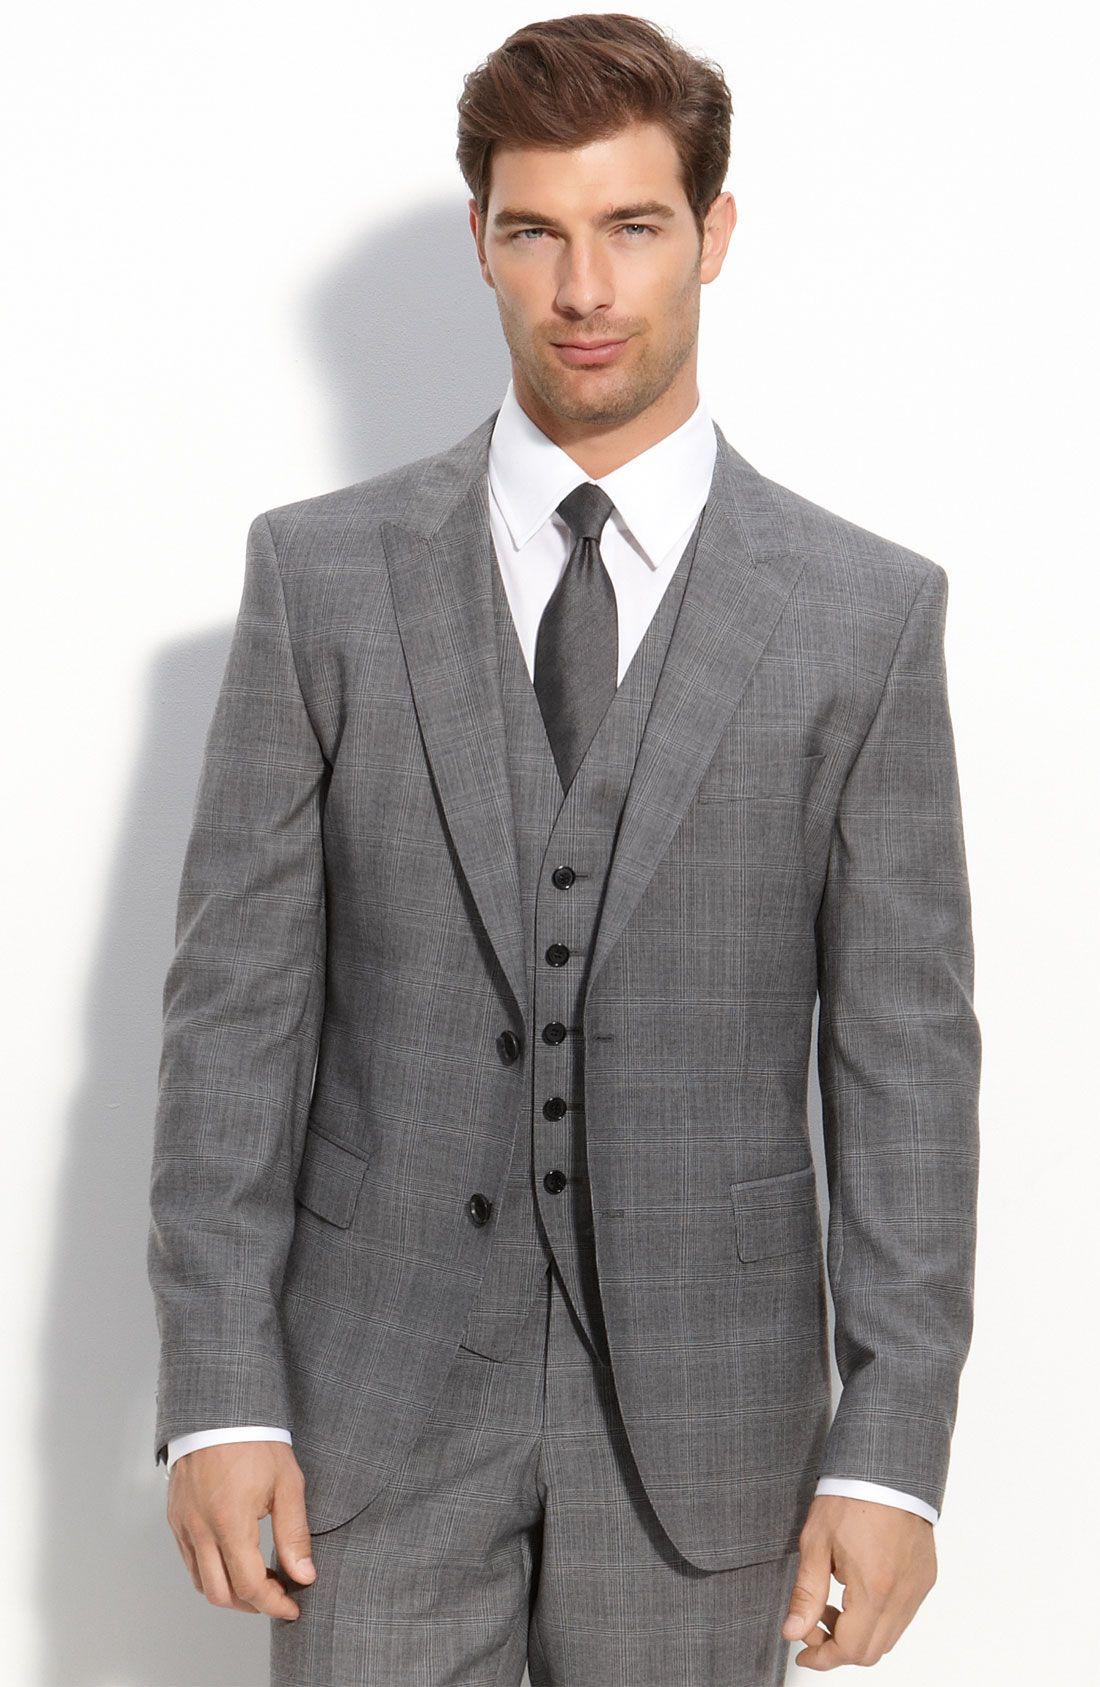 isaia napoli suit - Căutare Google | Formal | Pinterest | Suits ...